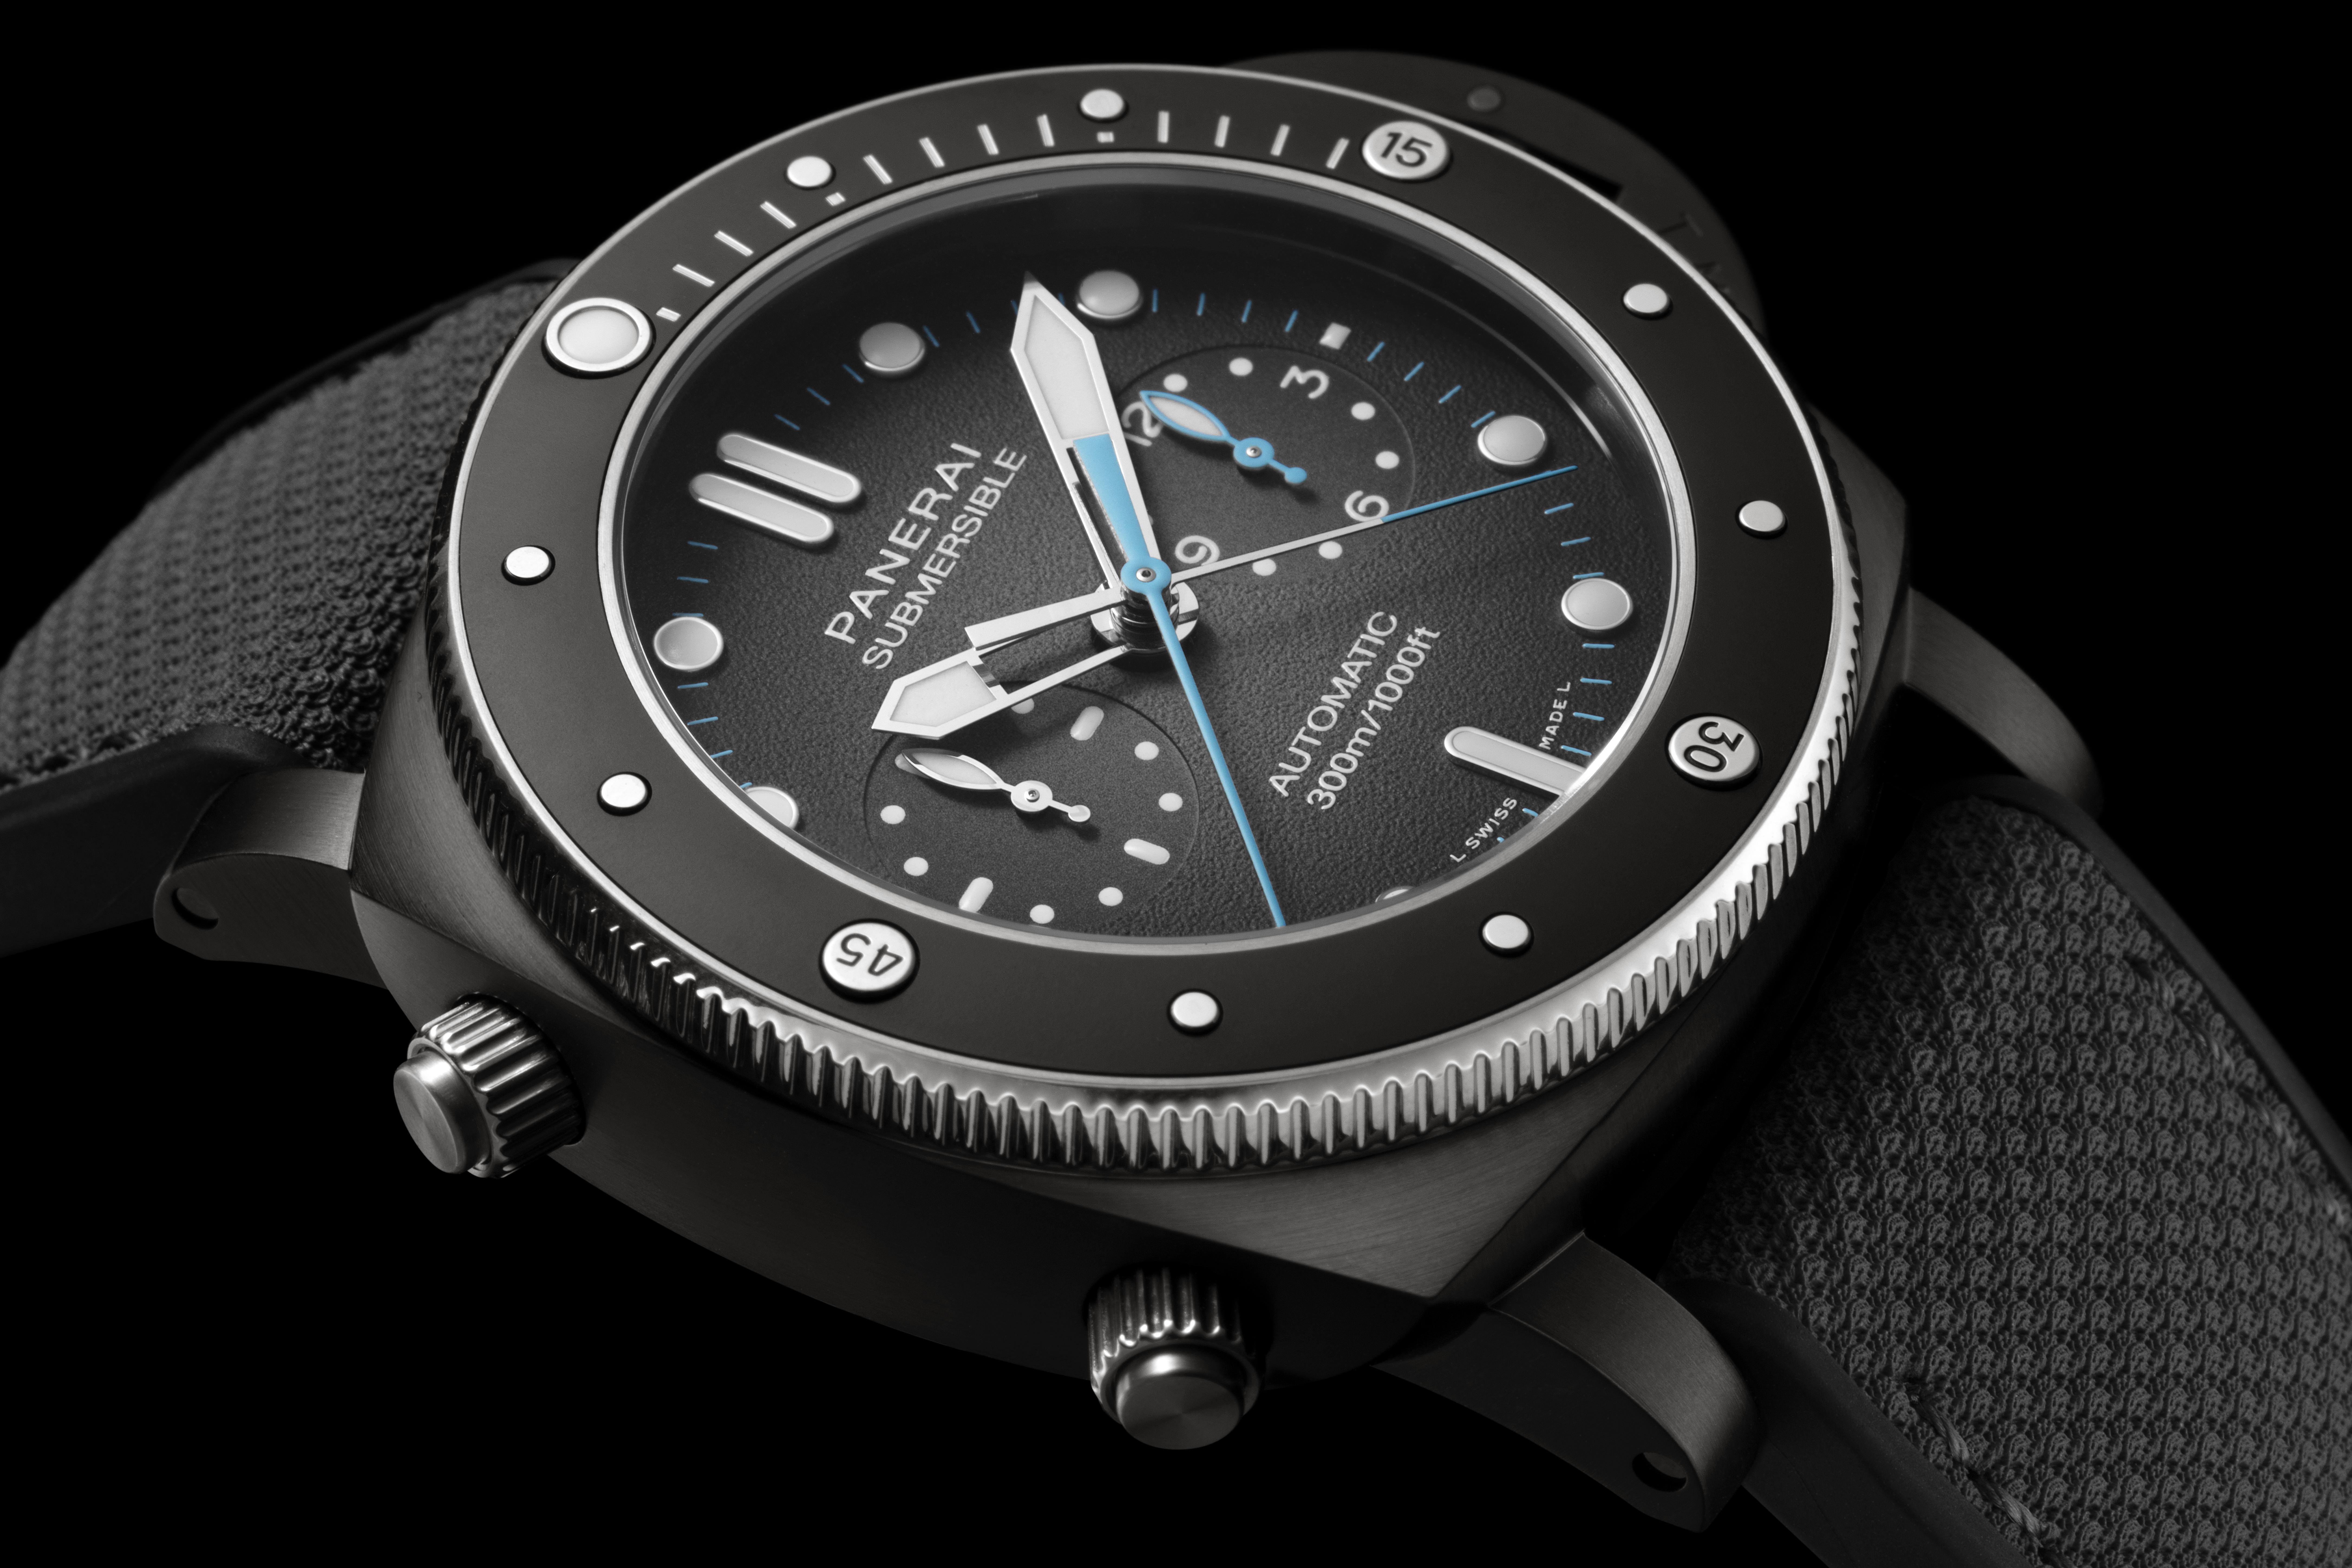 Panerai-Submersible-Chrono-Flyback-Jimmy-Chin-2